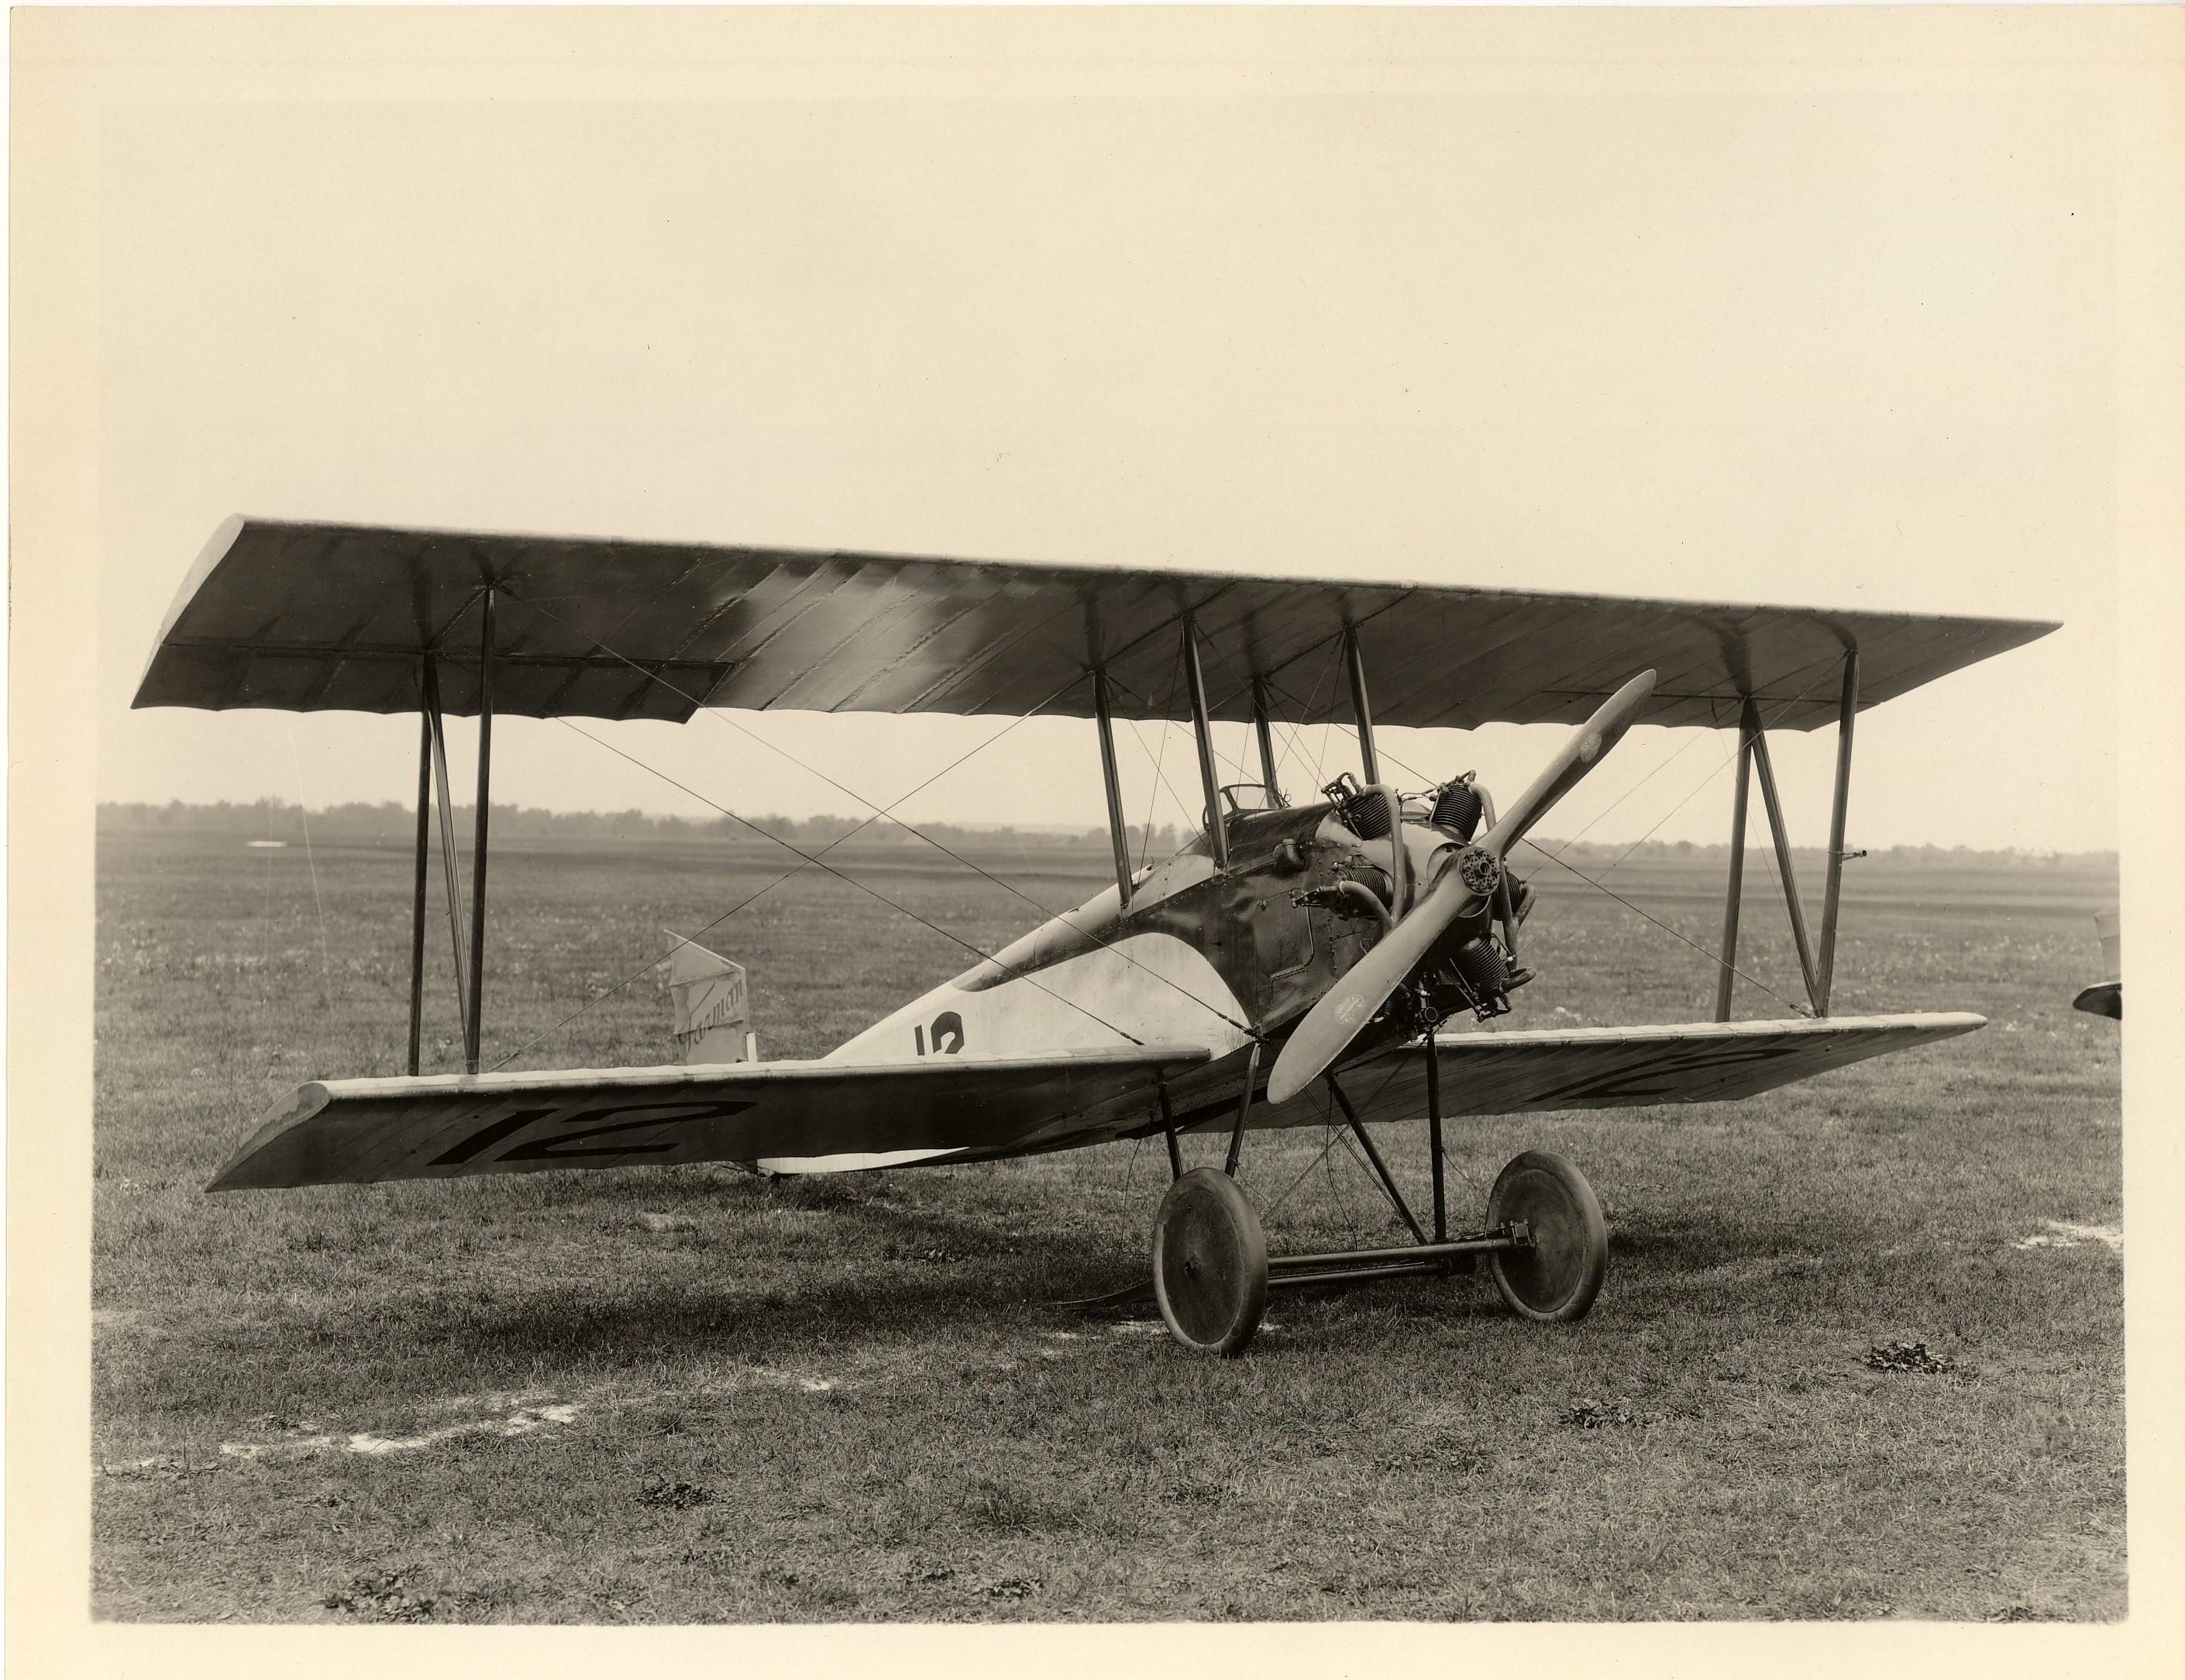 Ww1 German Planes >> WW1 Biplanes Wallpaper - WallpaperSafari